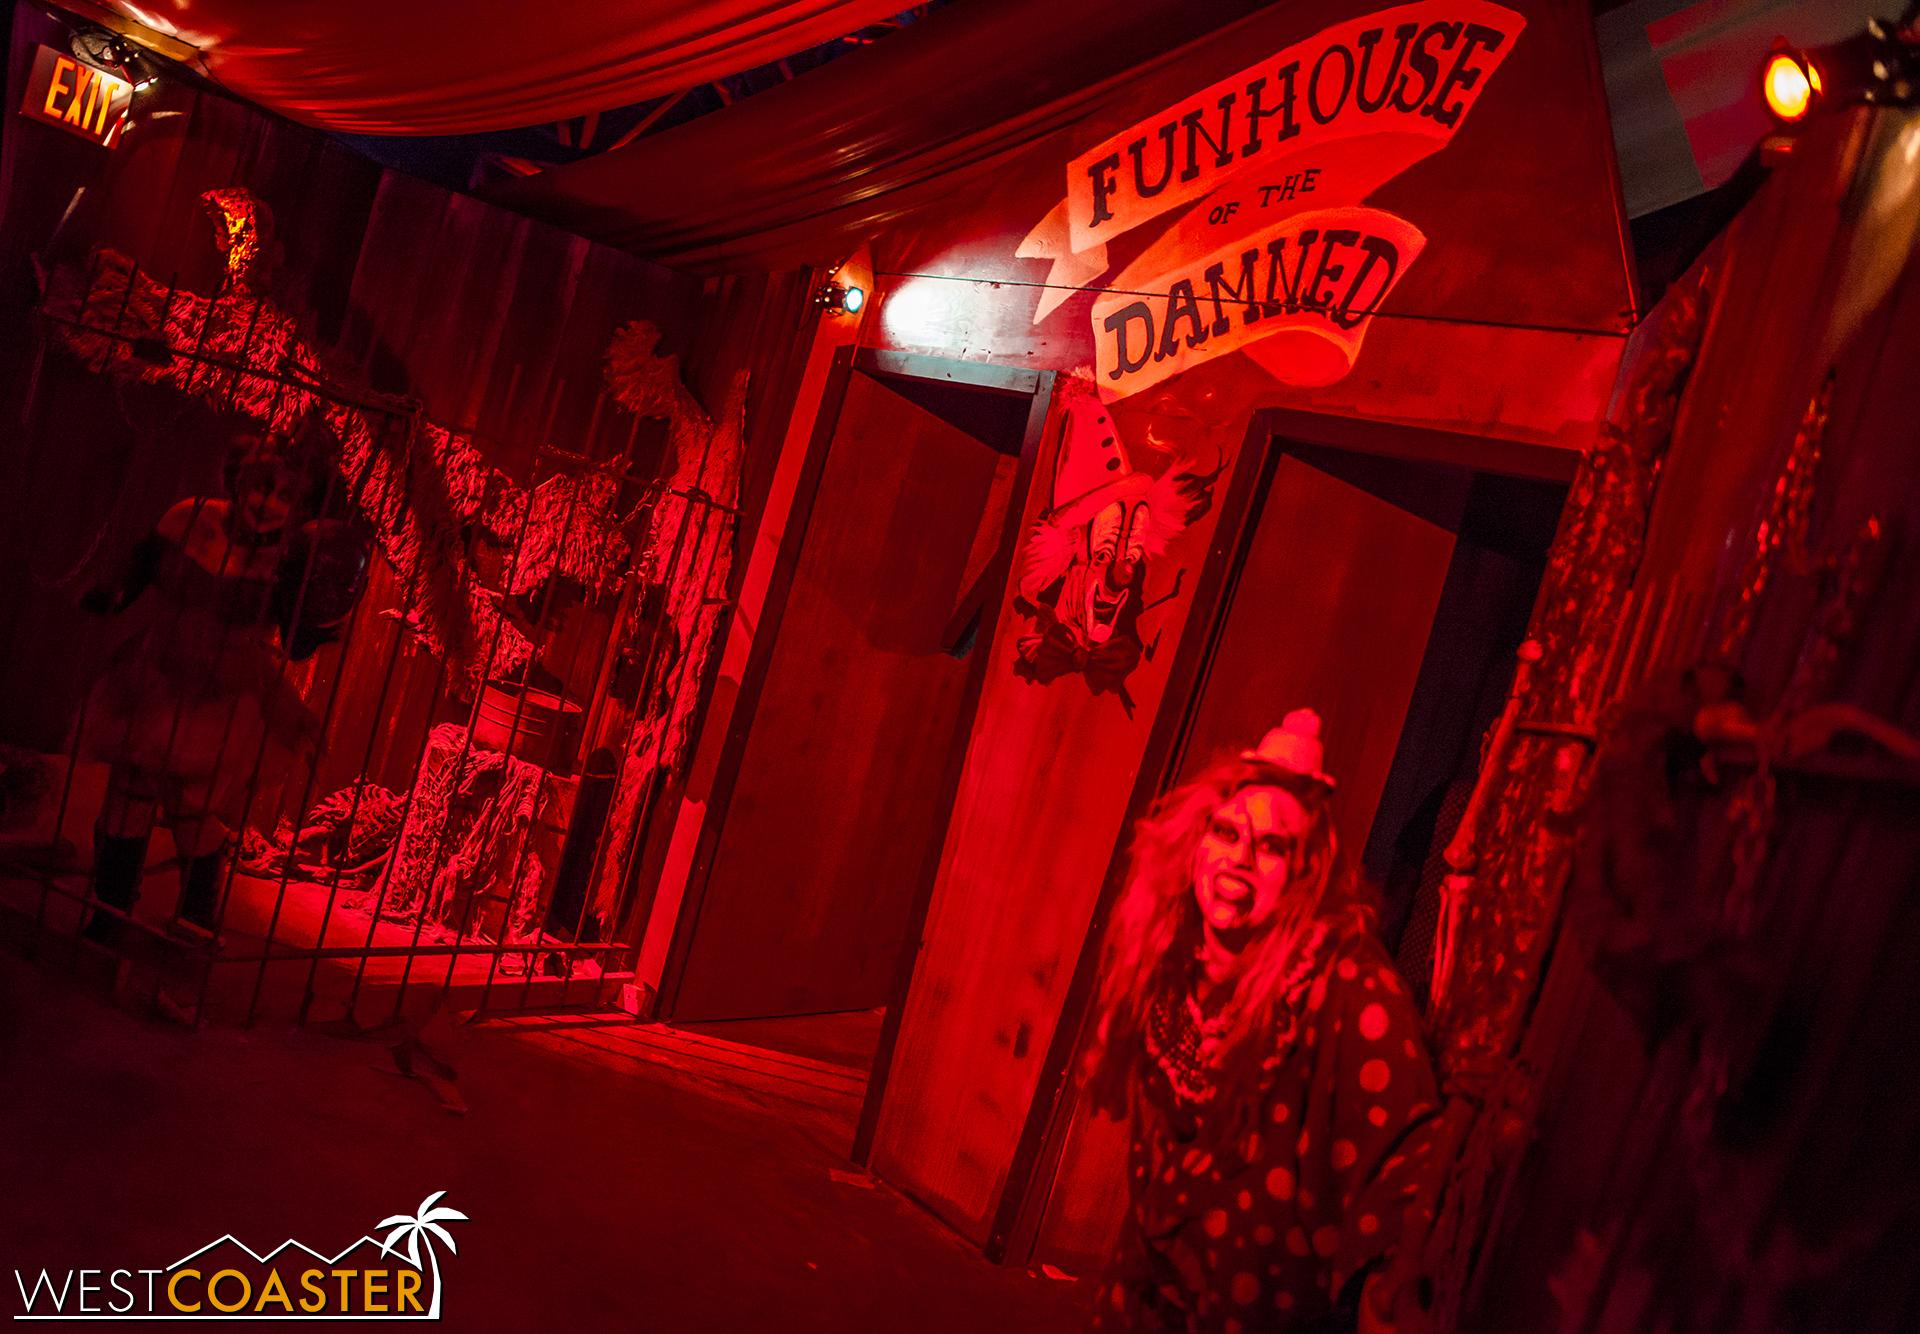 Onto the funhouse!